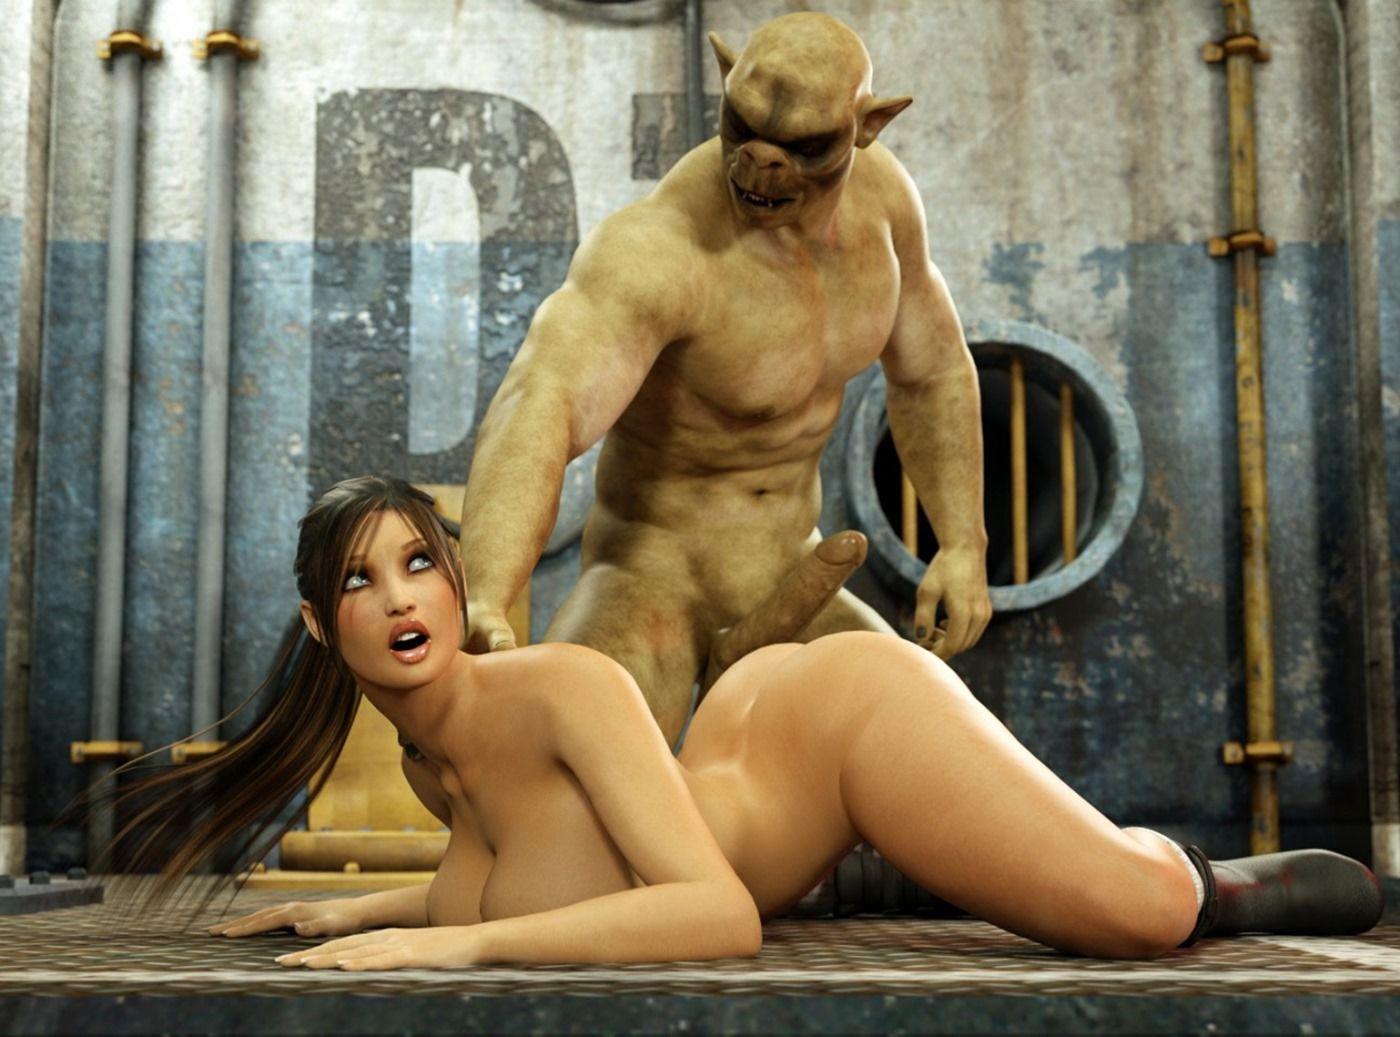 Monster sex flash movies